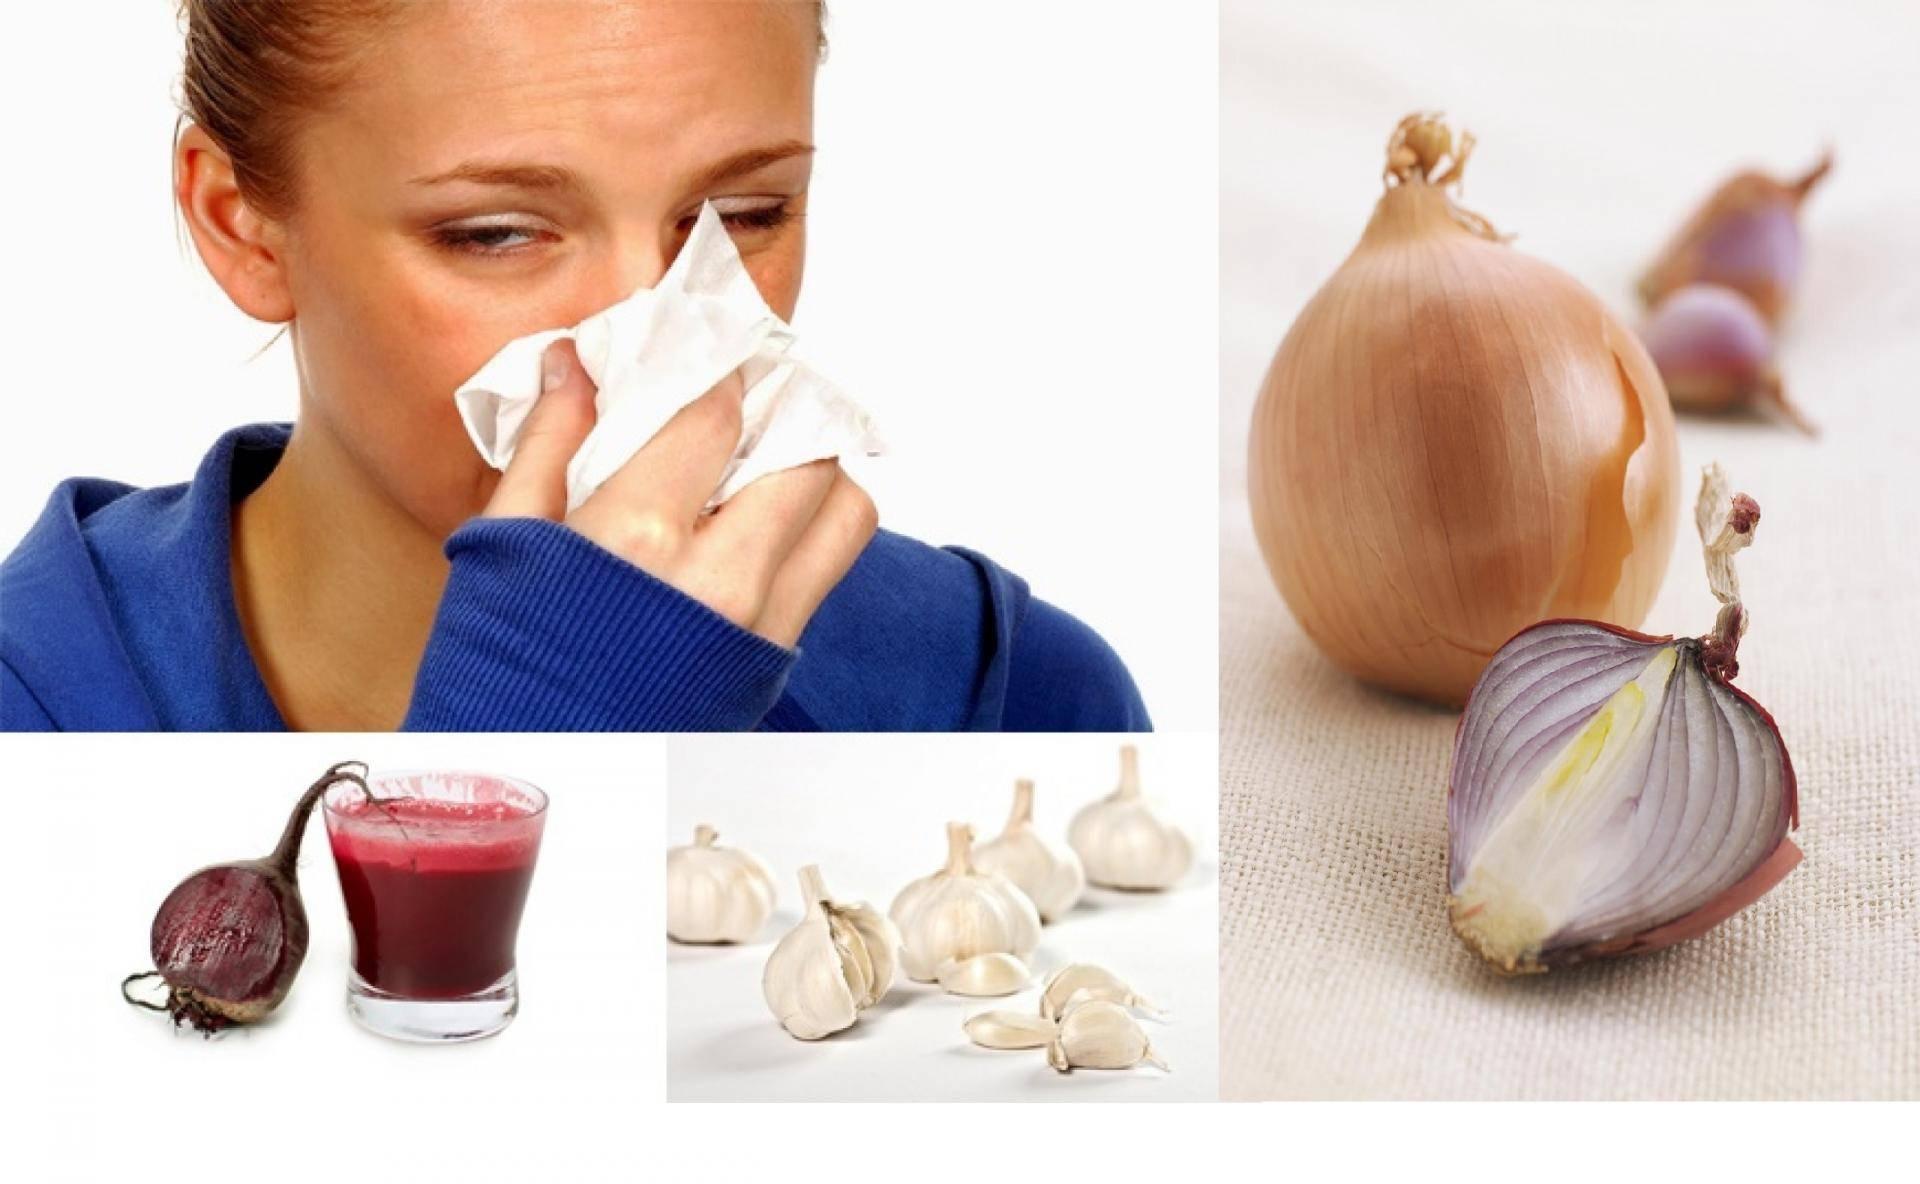 Лечение гайморита каштаном в домашних условиях